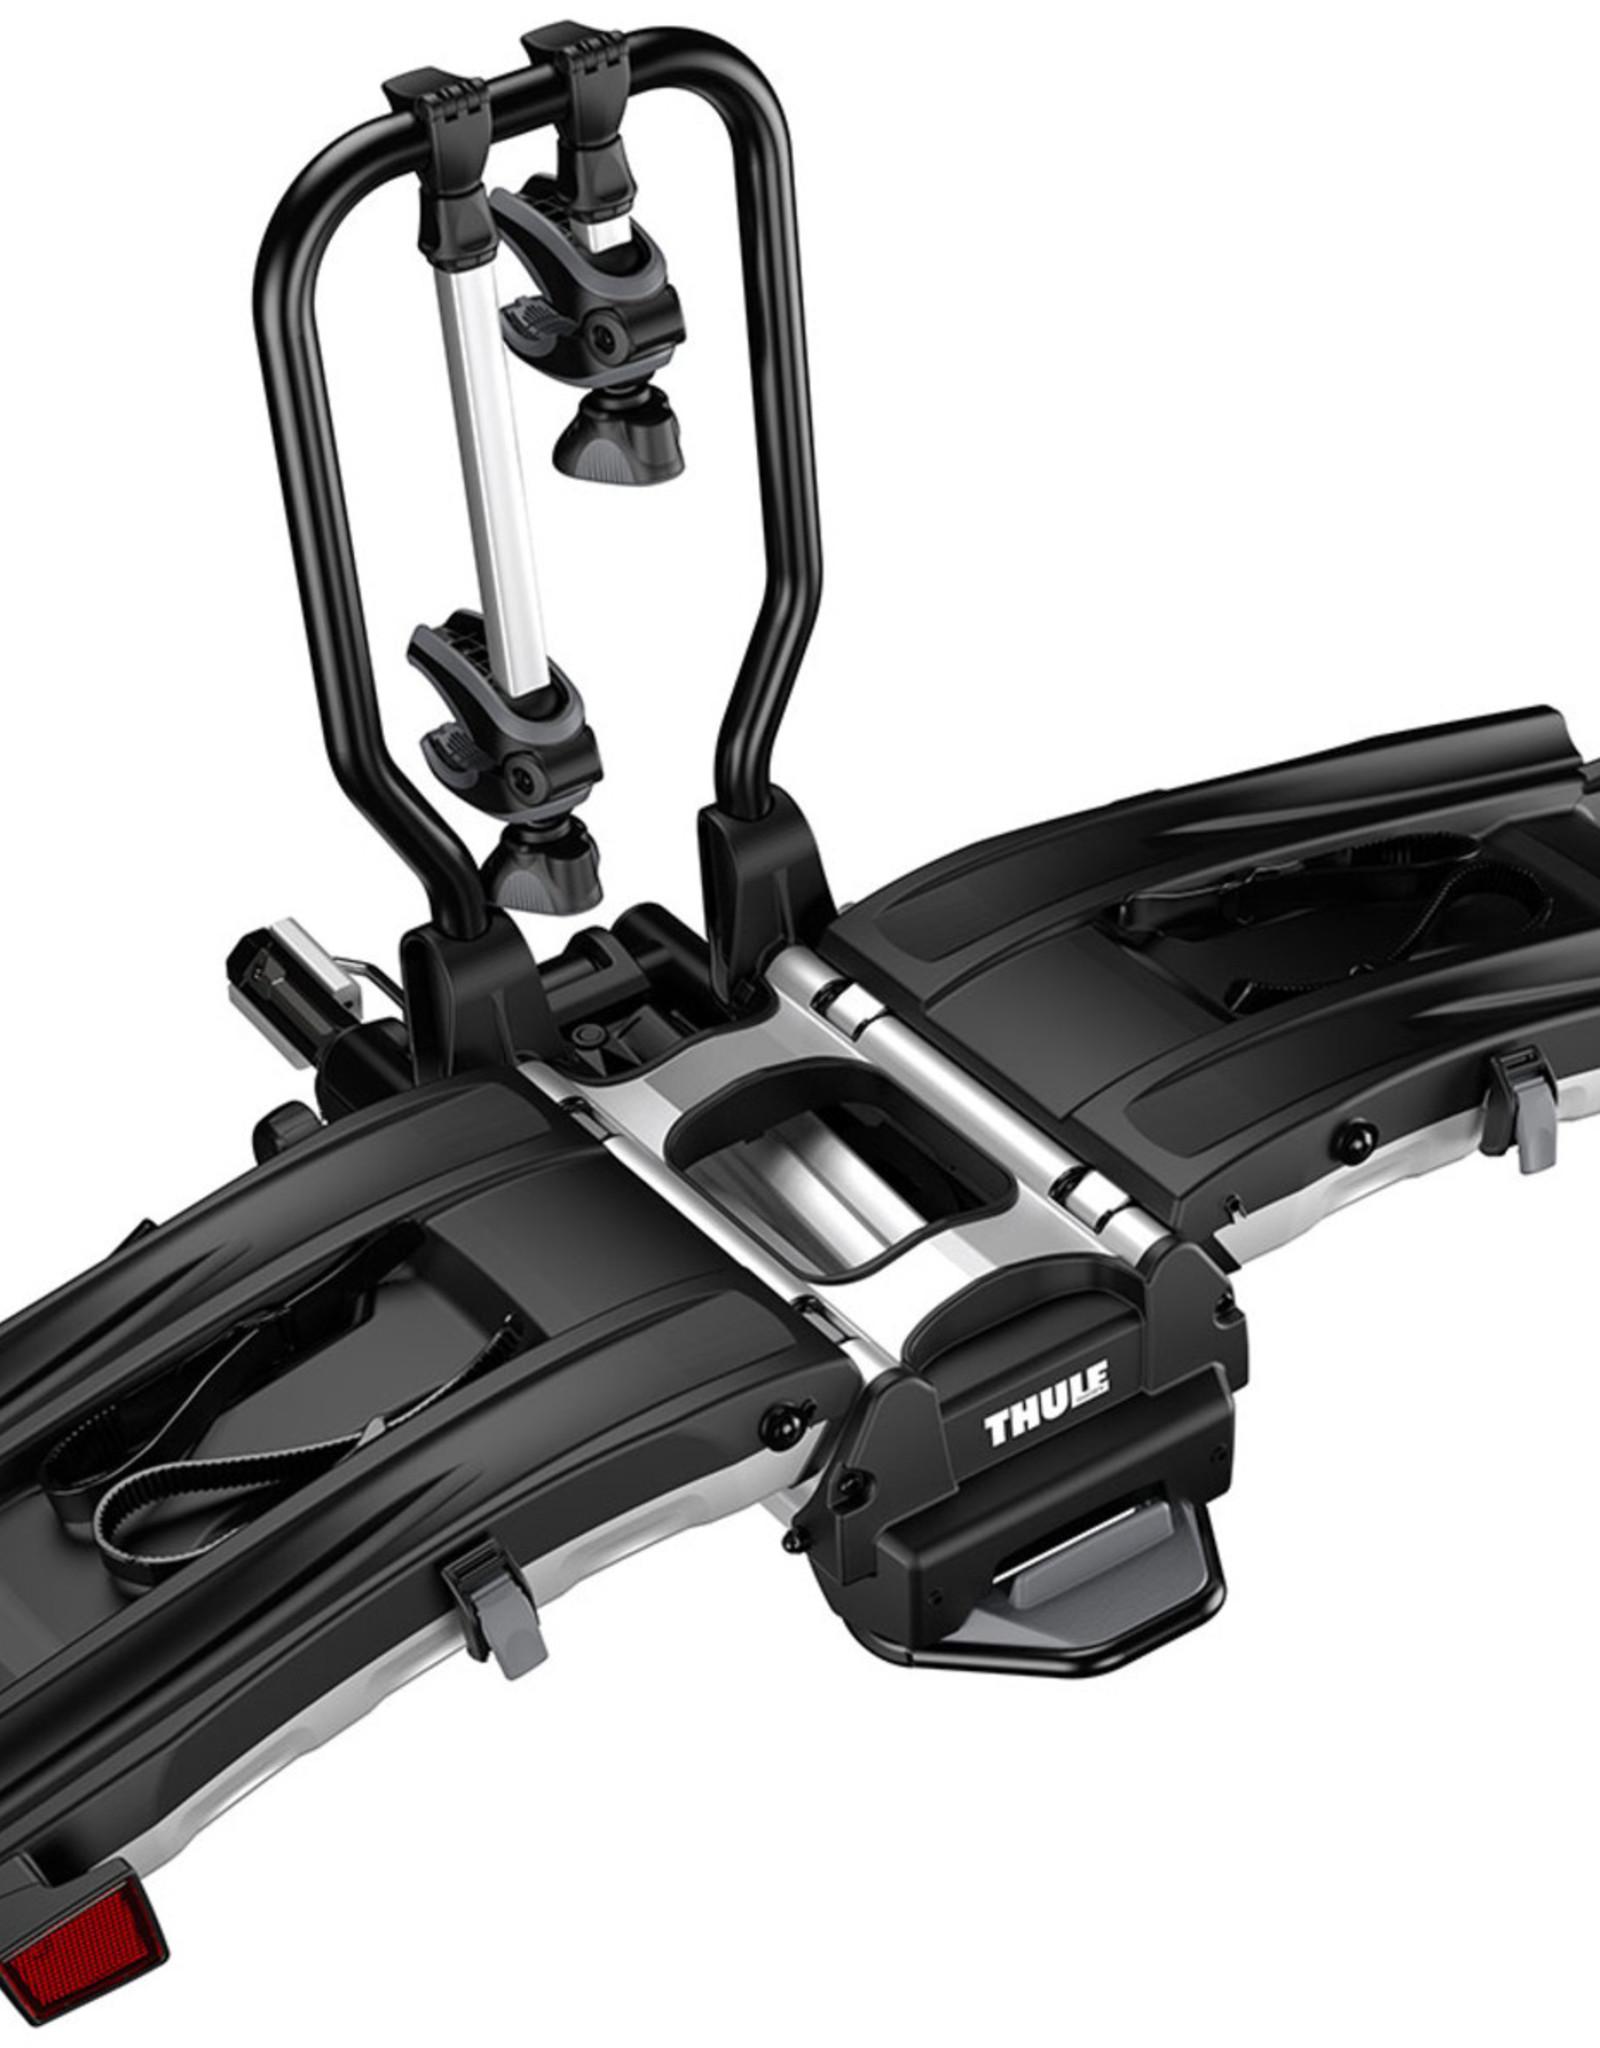 "Thule Thule EasyFold XT Hitch Bike Rack - 2-Bike, 1-1/4"", 2"" Receiver, Black"